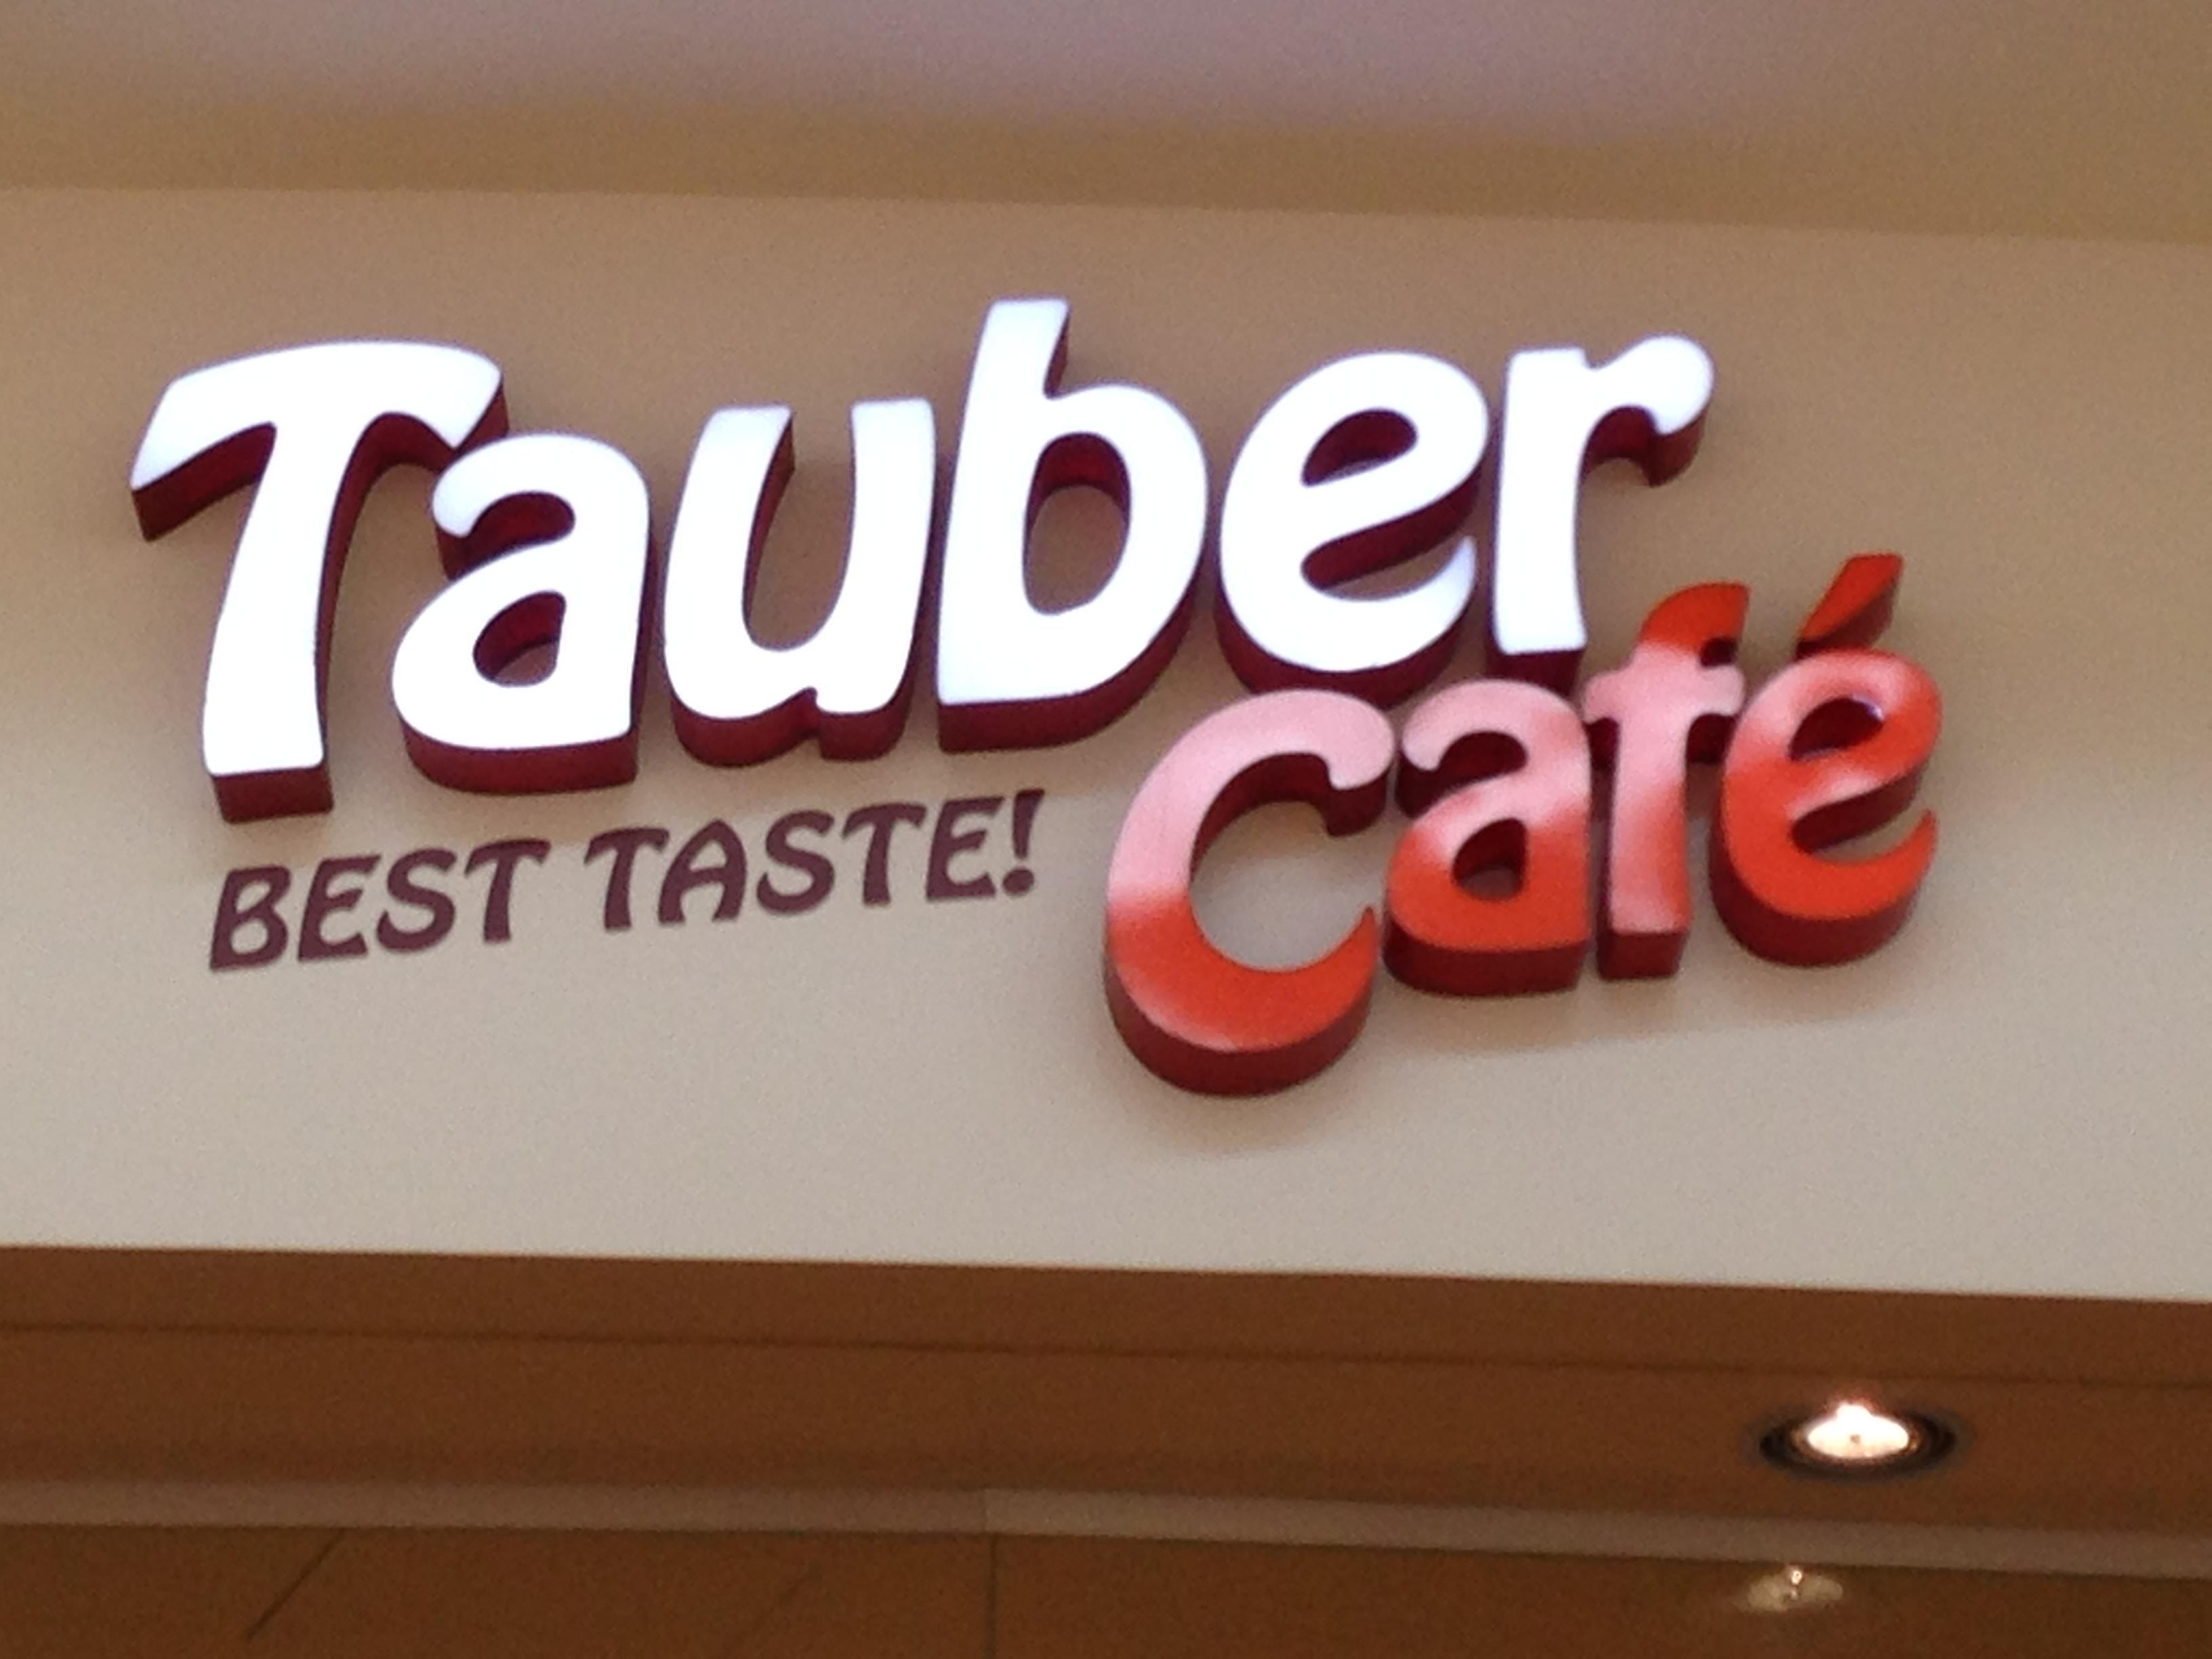 Tauber cafe